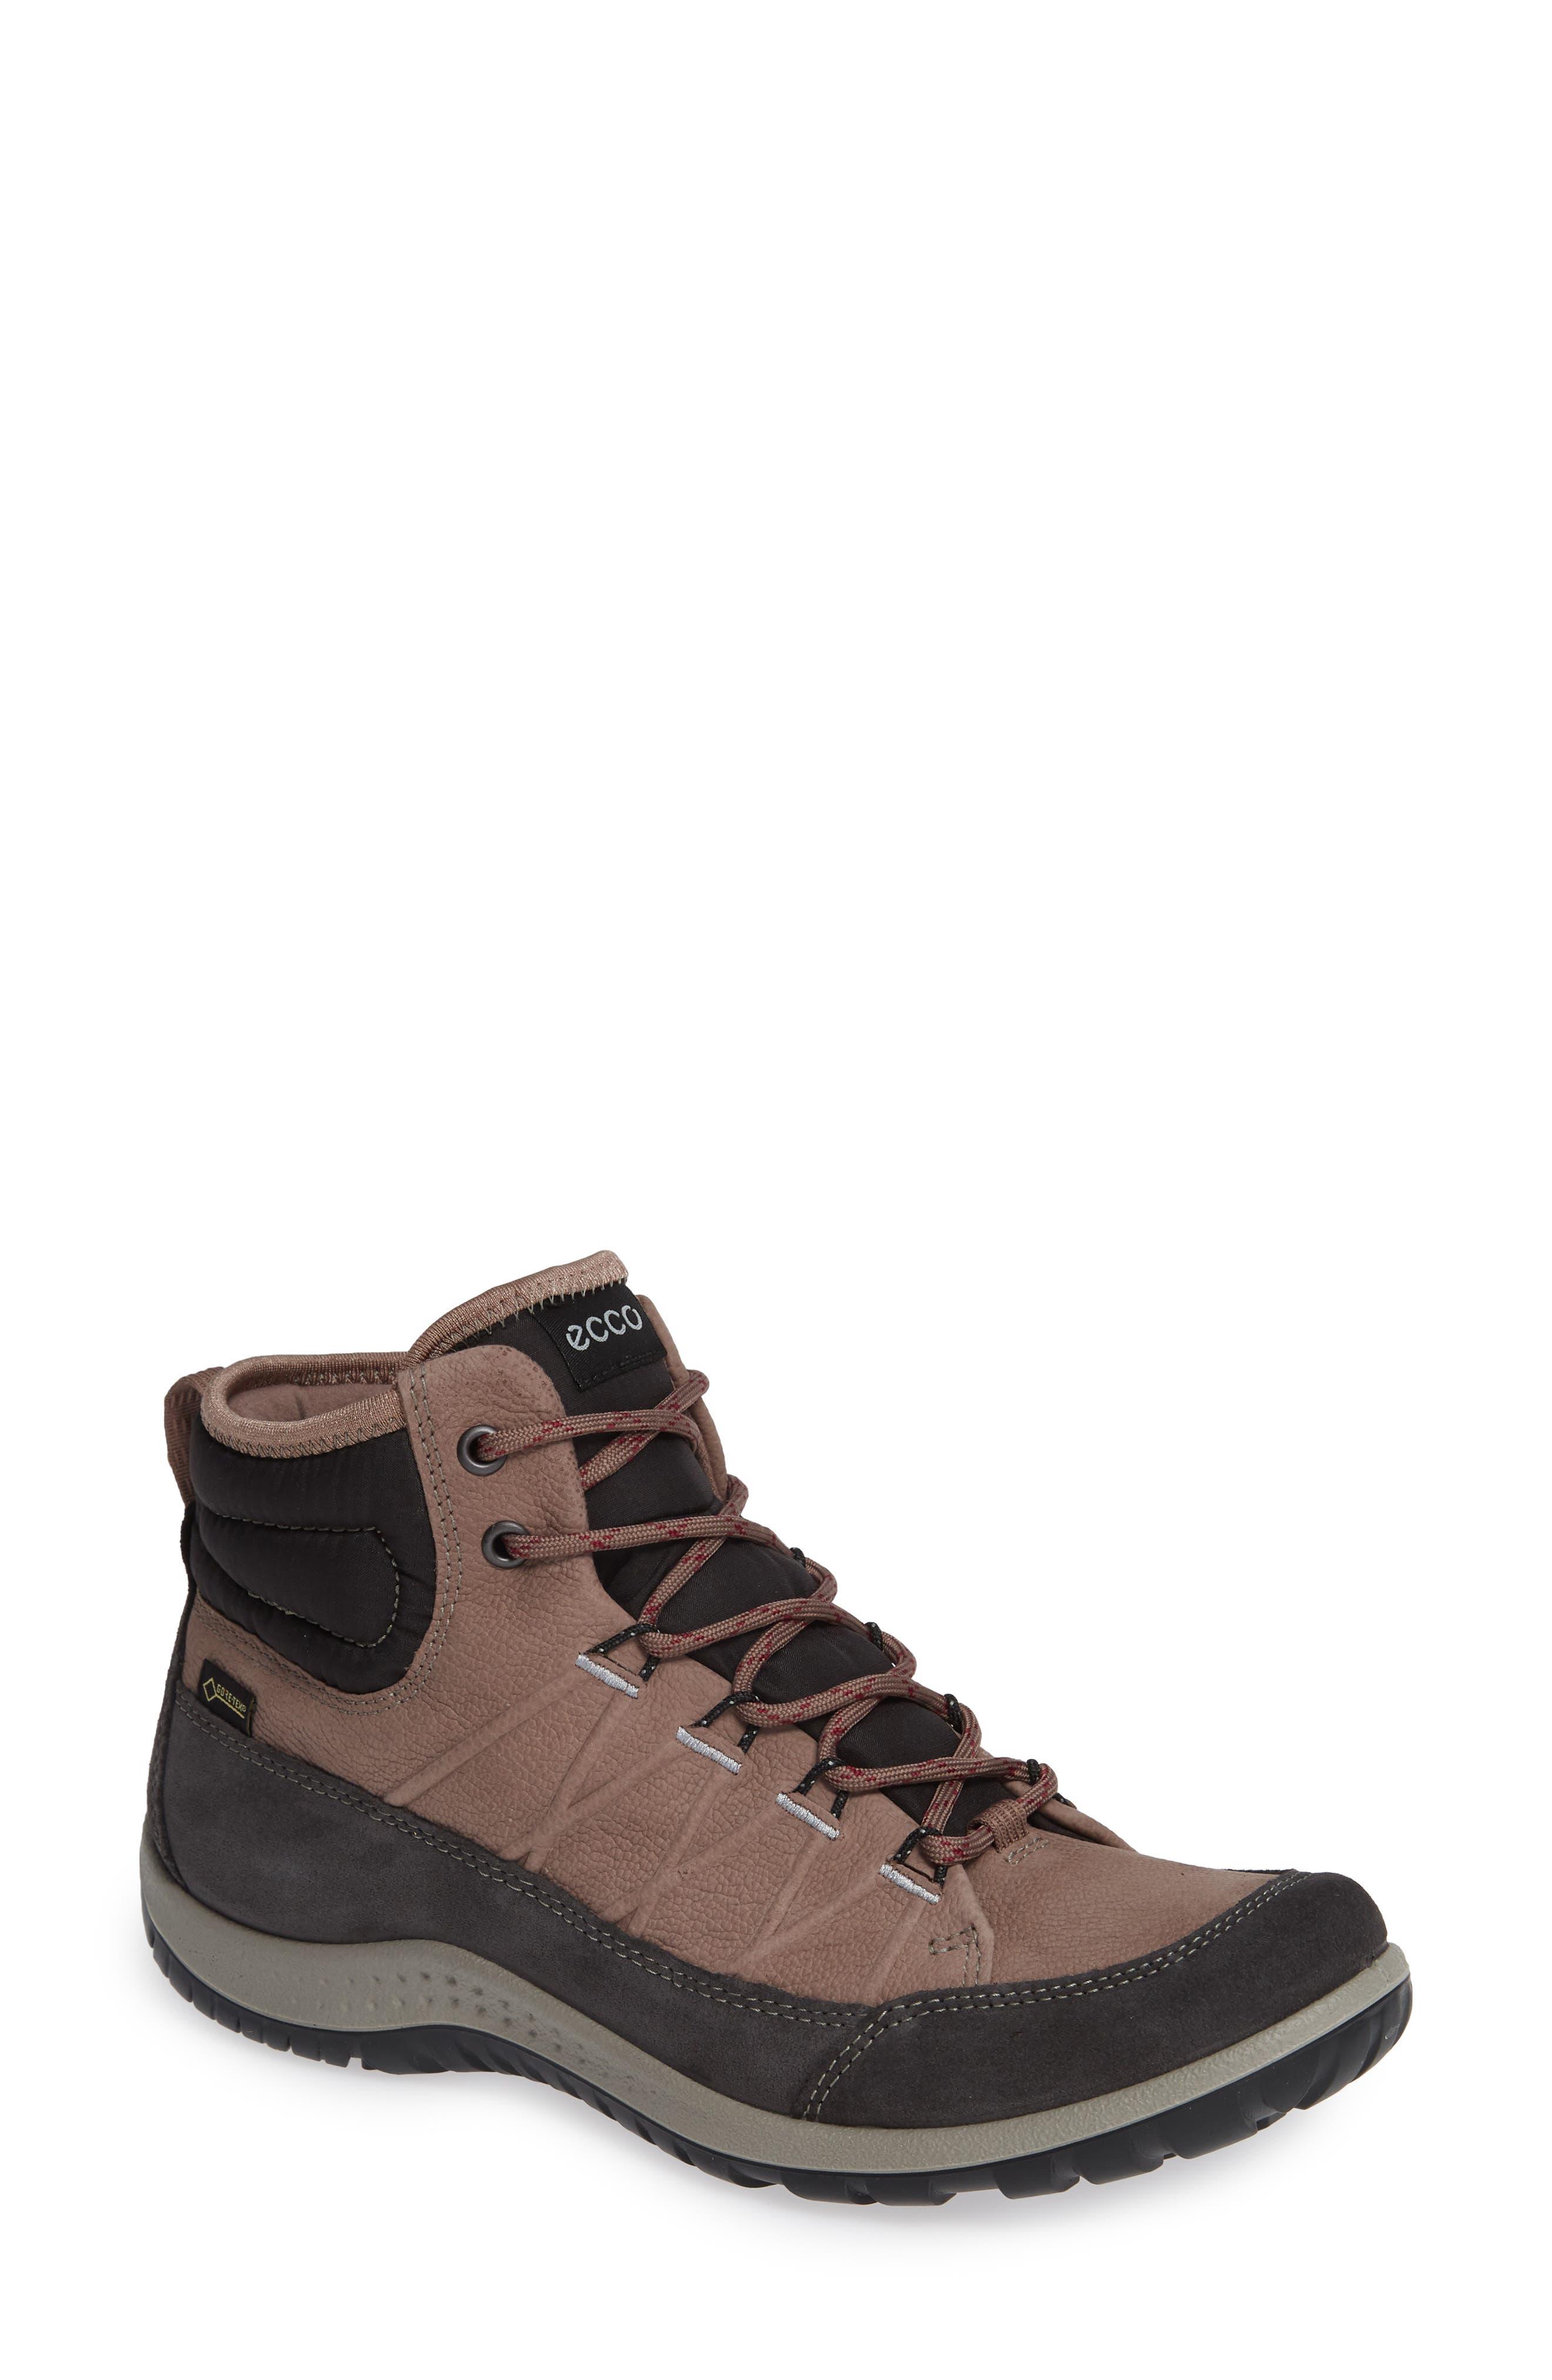 ECCO, 'Aspina GTX' Waterproof High Top Shoe, Main thumbnail 1, color, DEEP TAUPE NUBUCK LEATHER